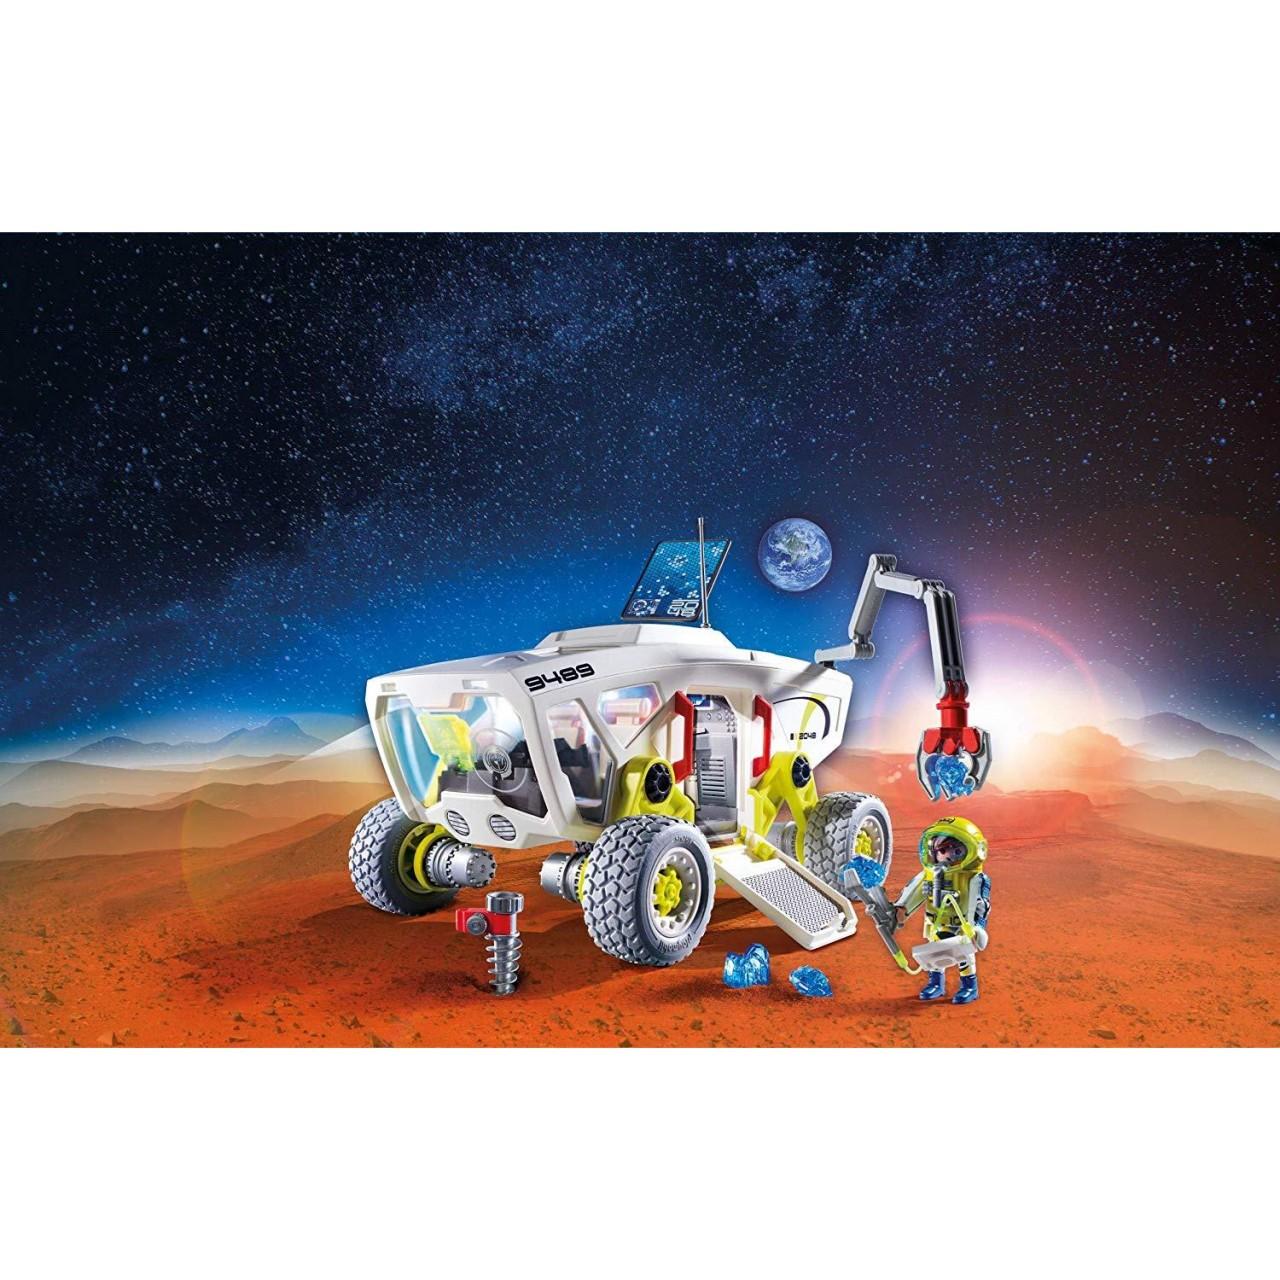 Playmobil 9489 Mars-Erkundungsfahrzeug